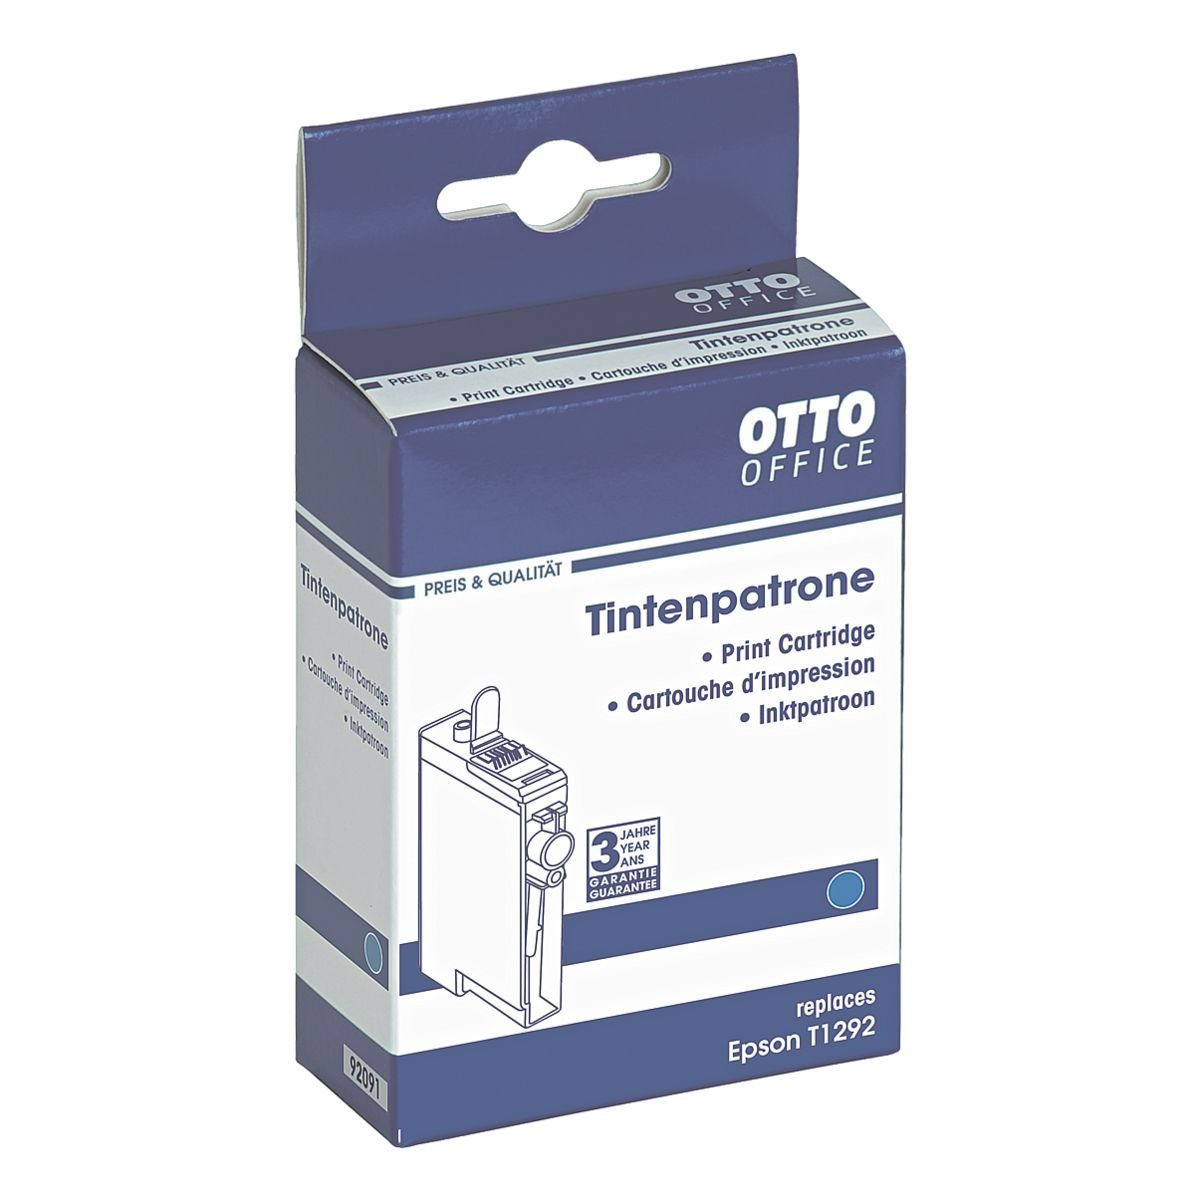 OTTO Office Standard Tintenpatrone ersetzt Epson »T1292«